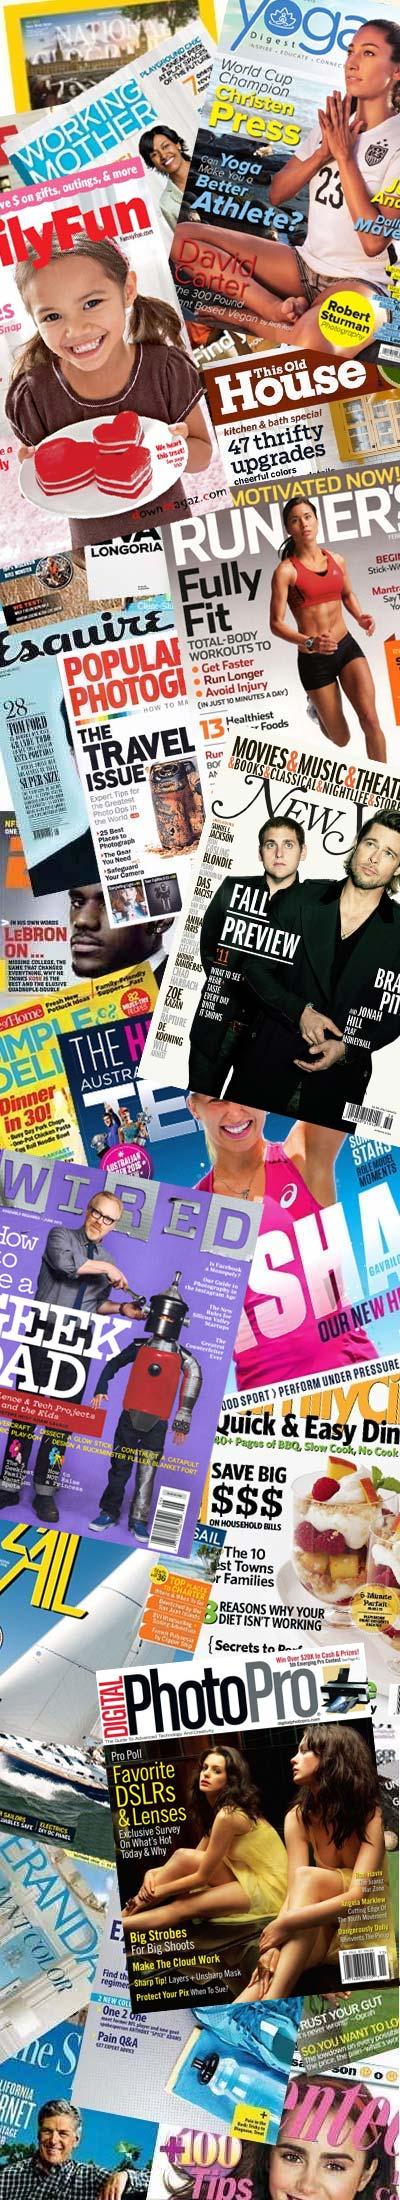 34 FREE Magazines Today Flying, Redbook, Runner's World